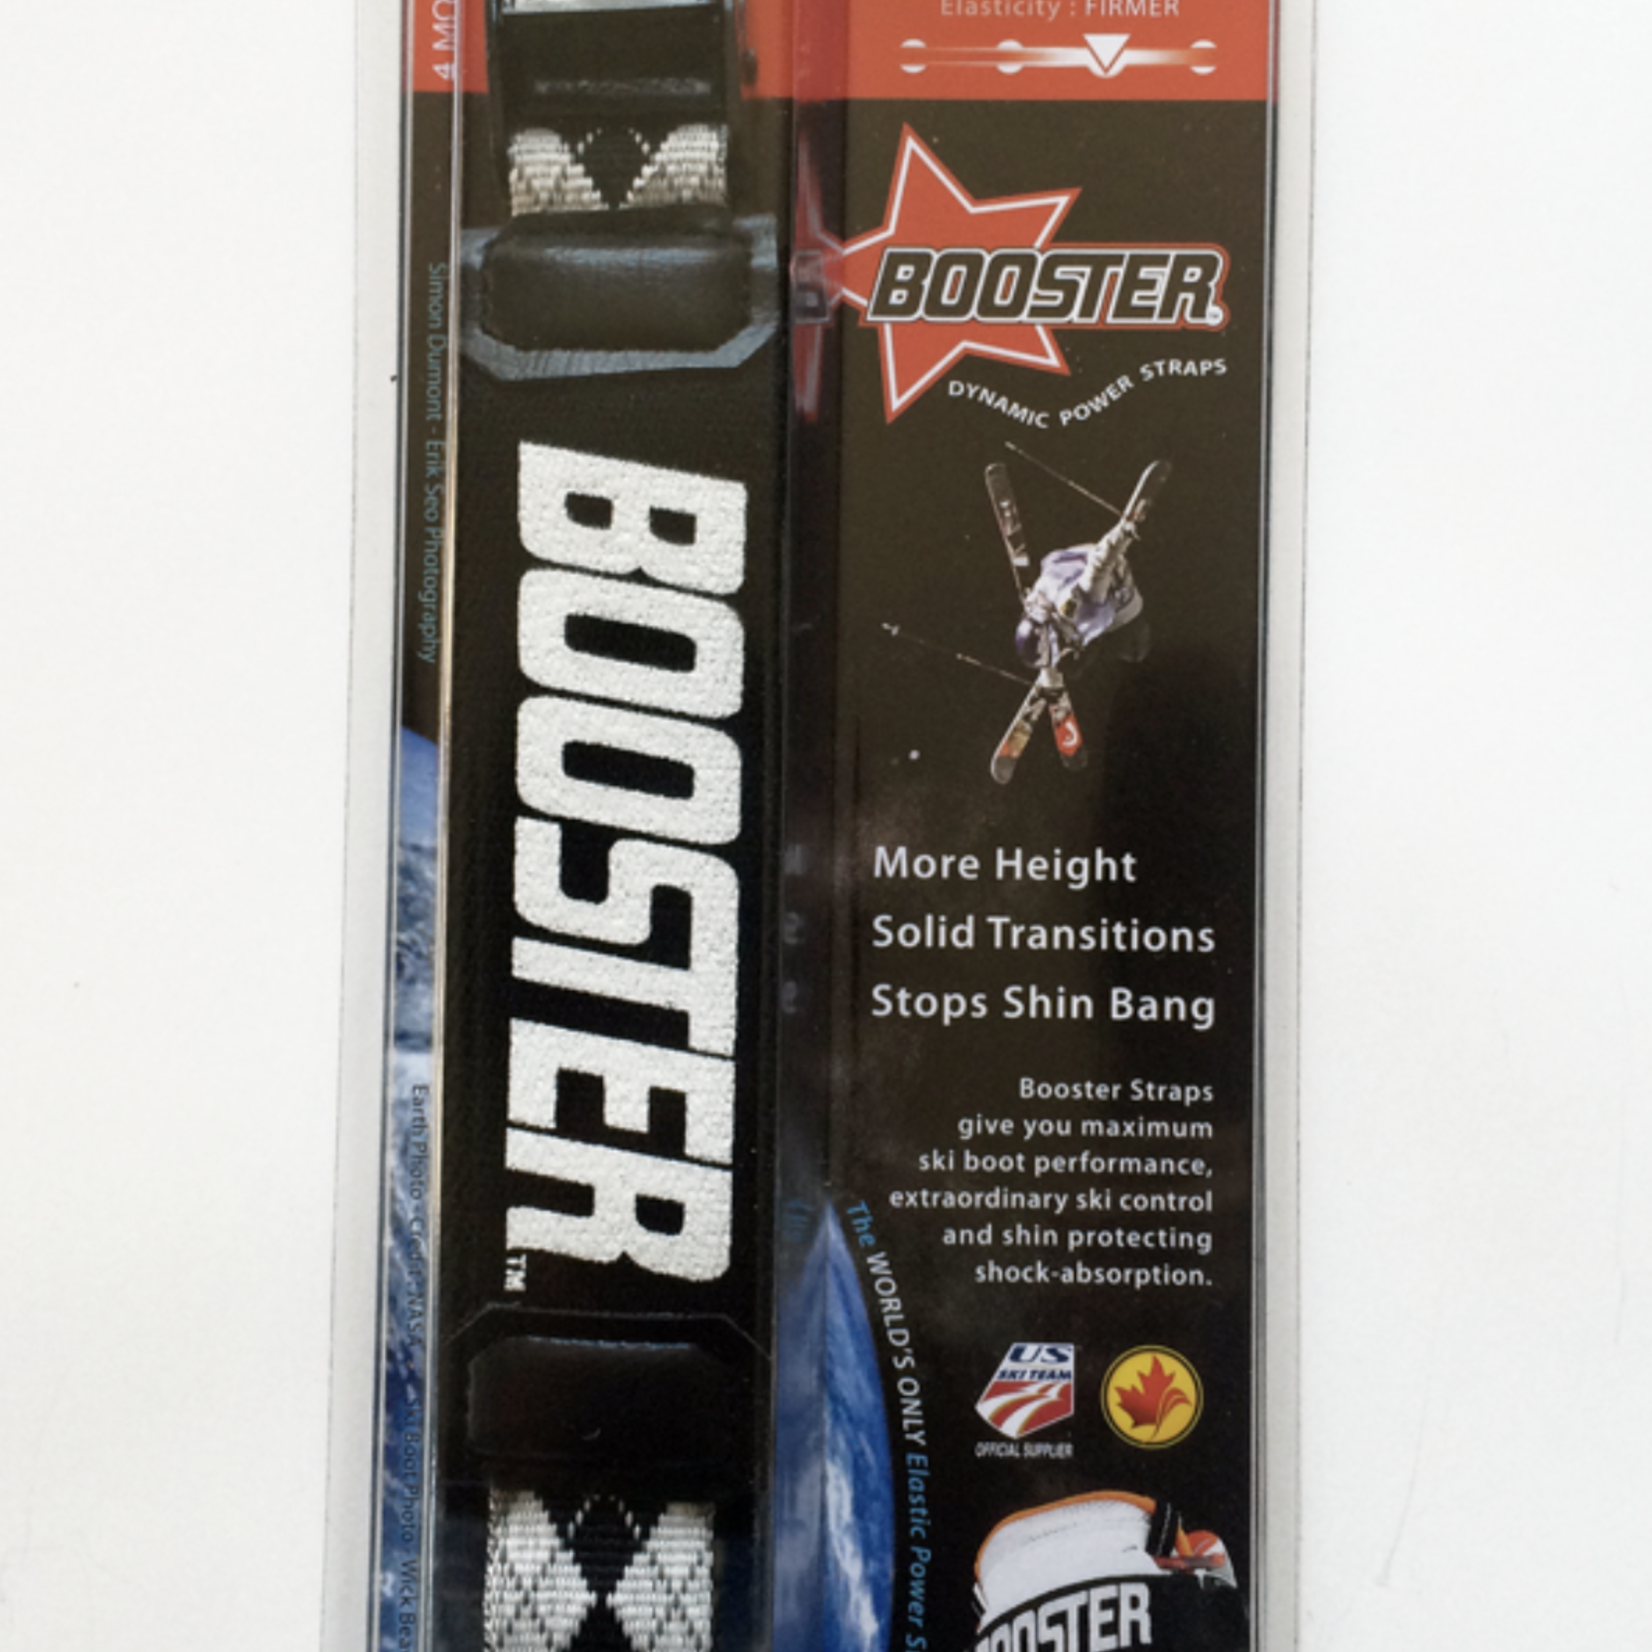 Booster Booster Strap Expert/Racer